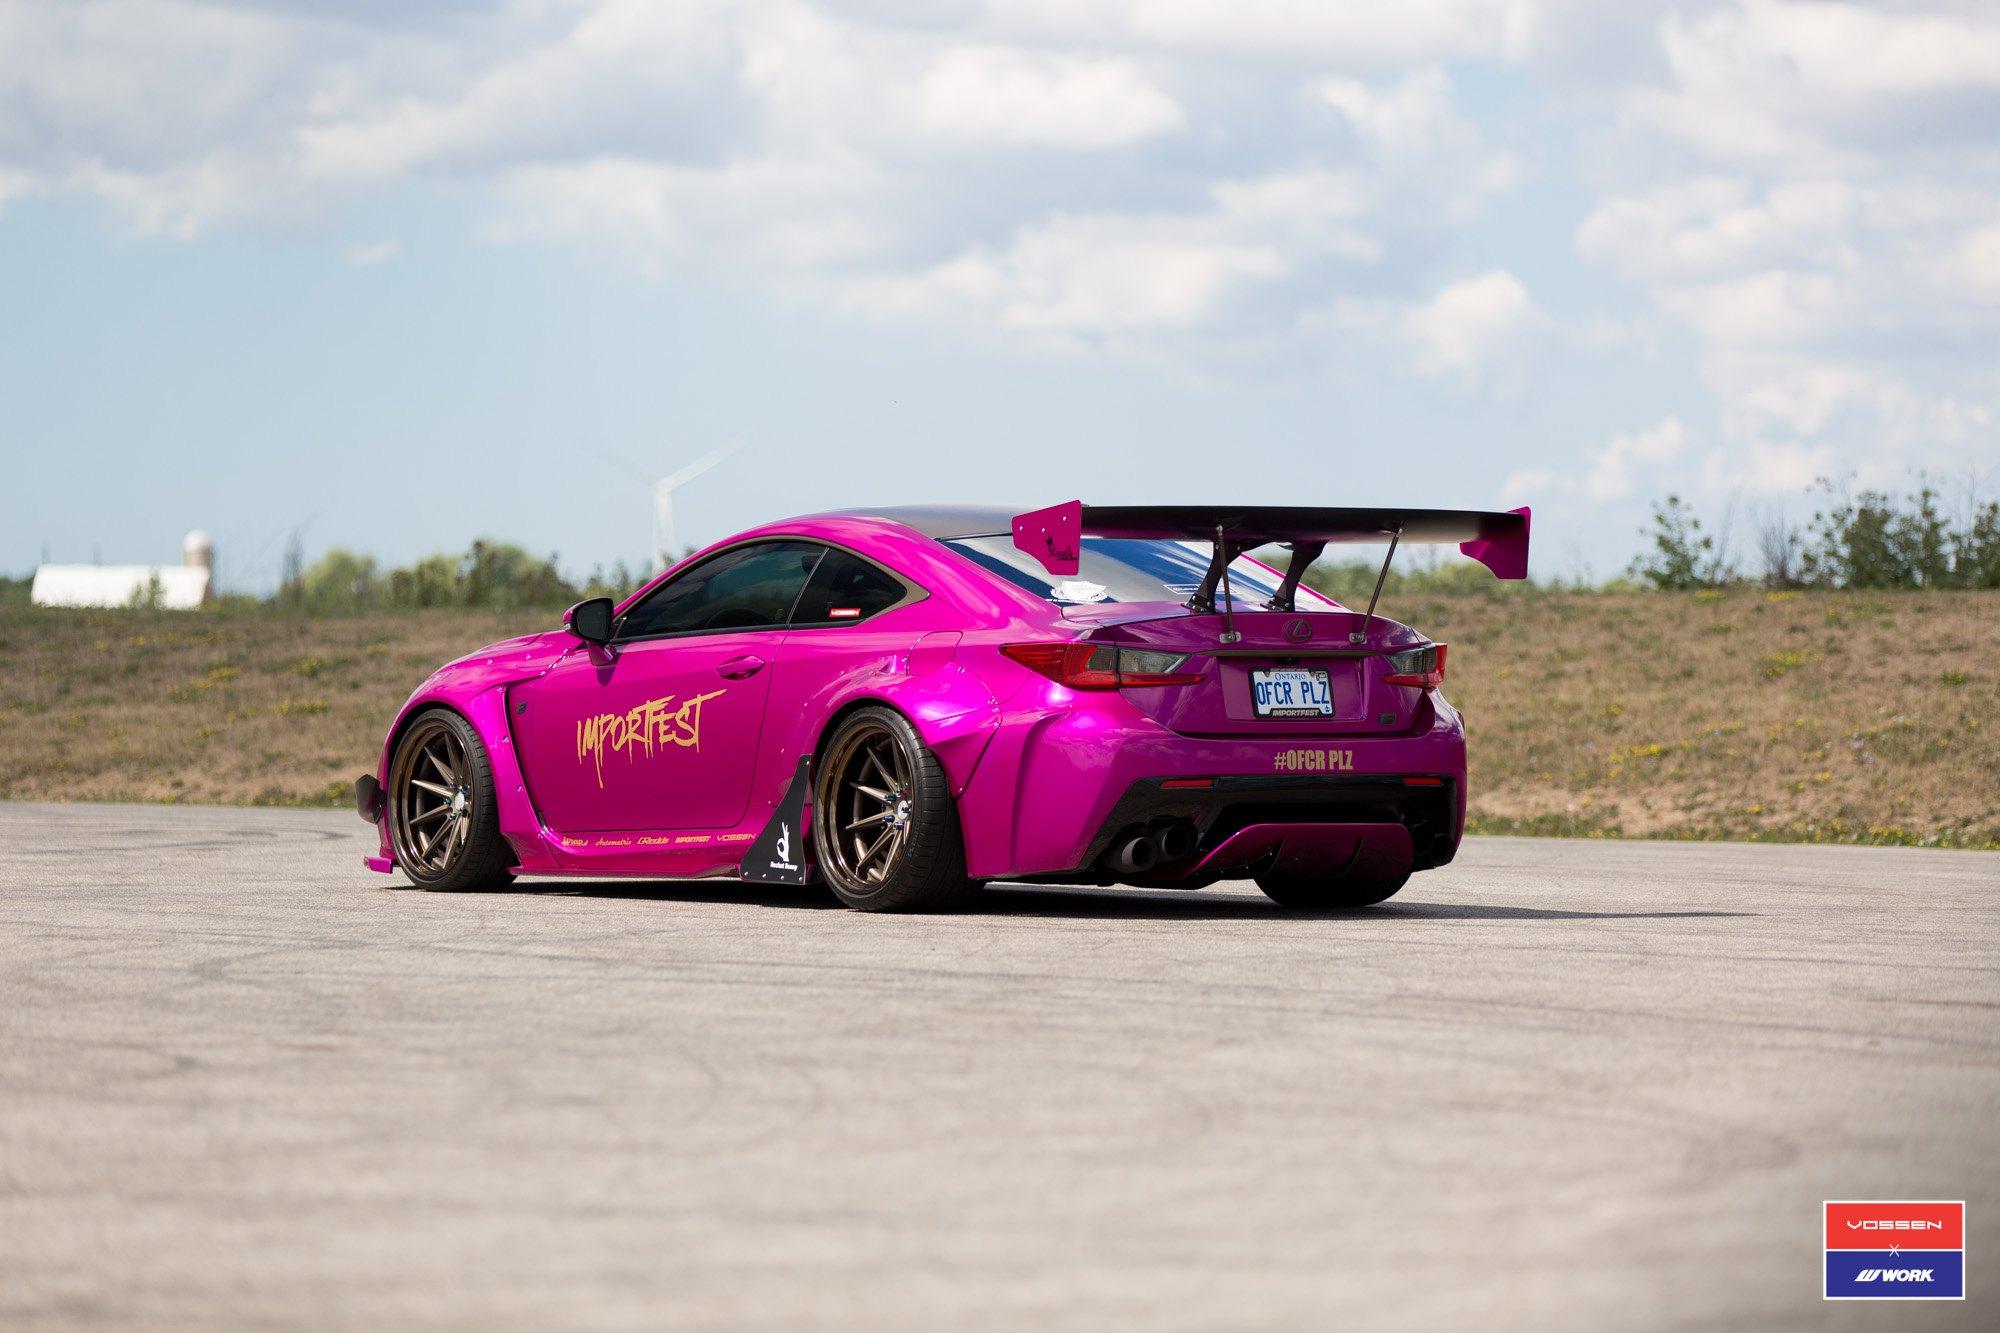 Rocket Bunny Wide Body Kit on Pink Lexus RC F — CARiD com